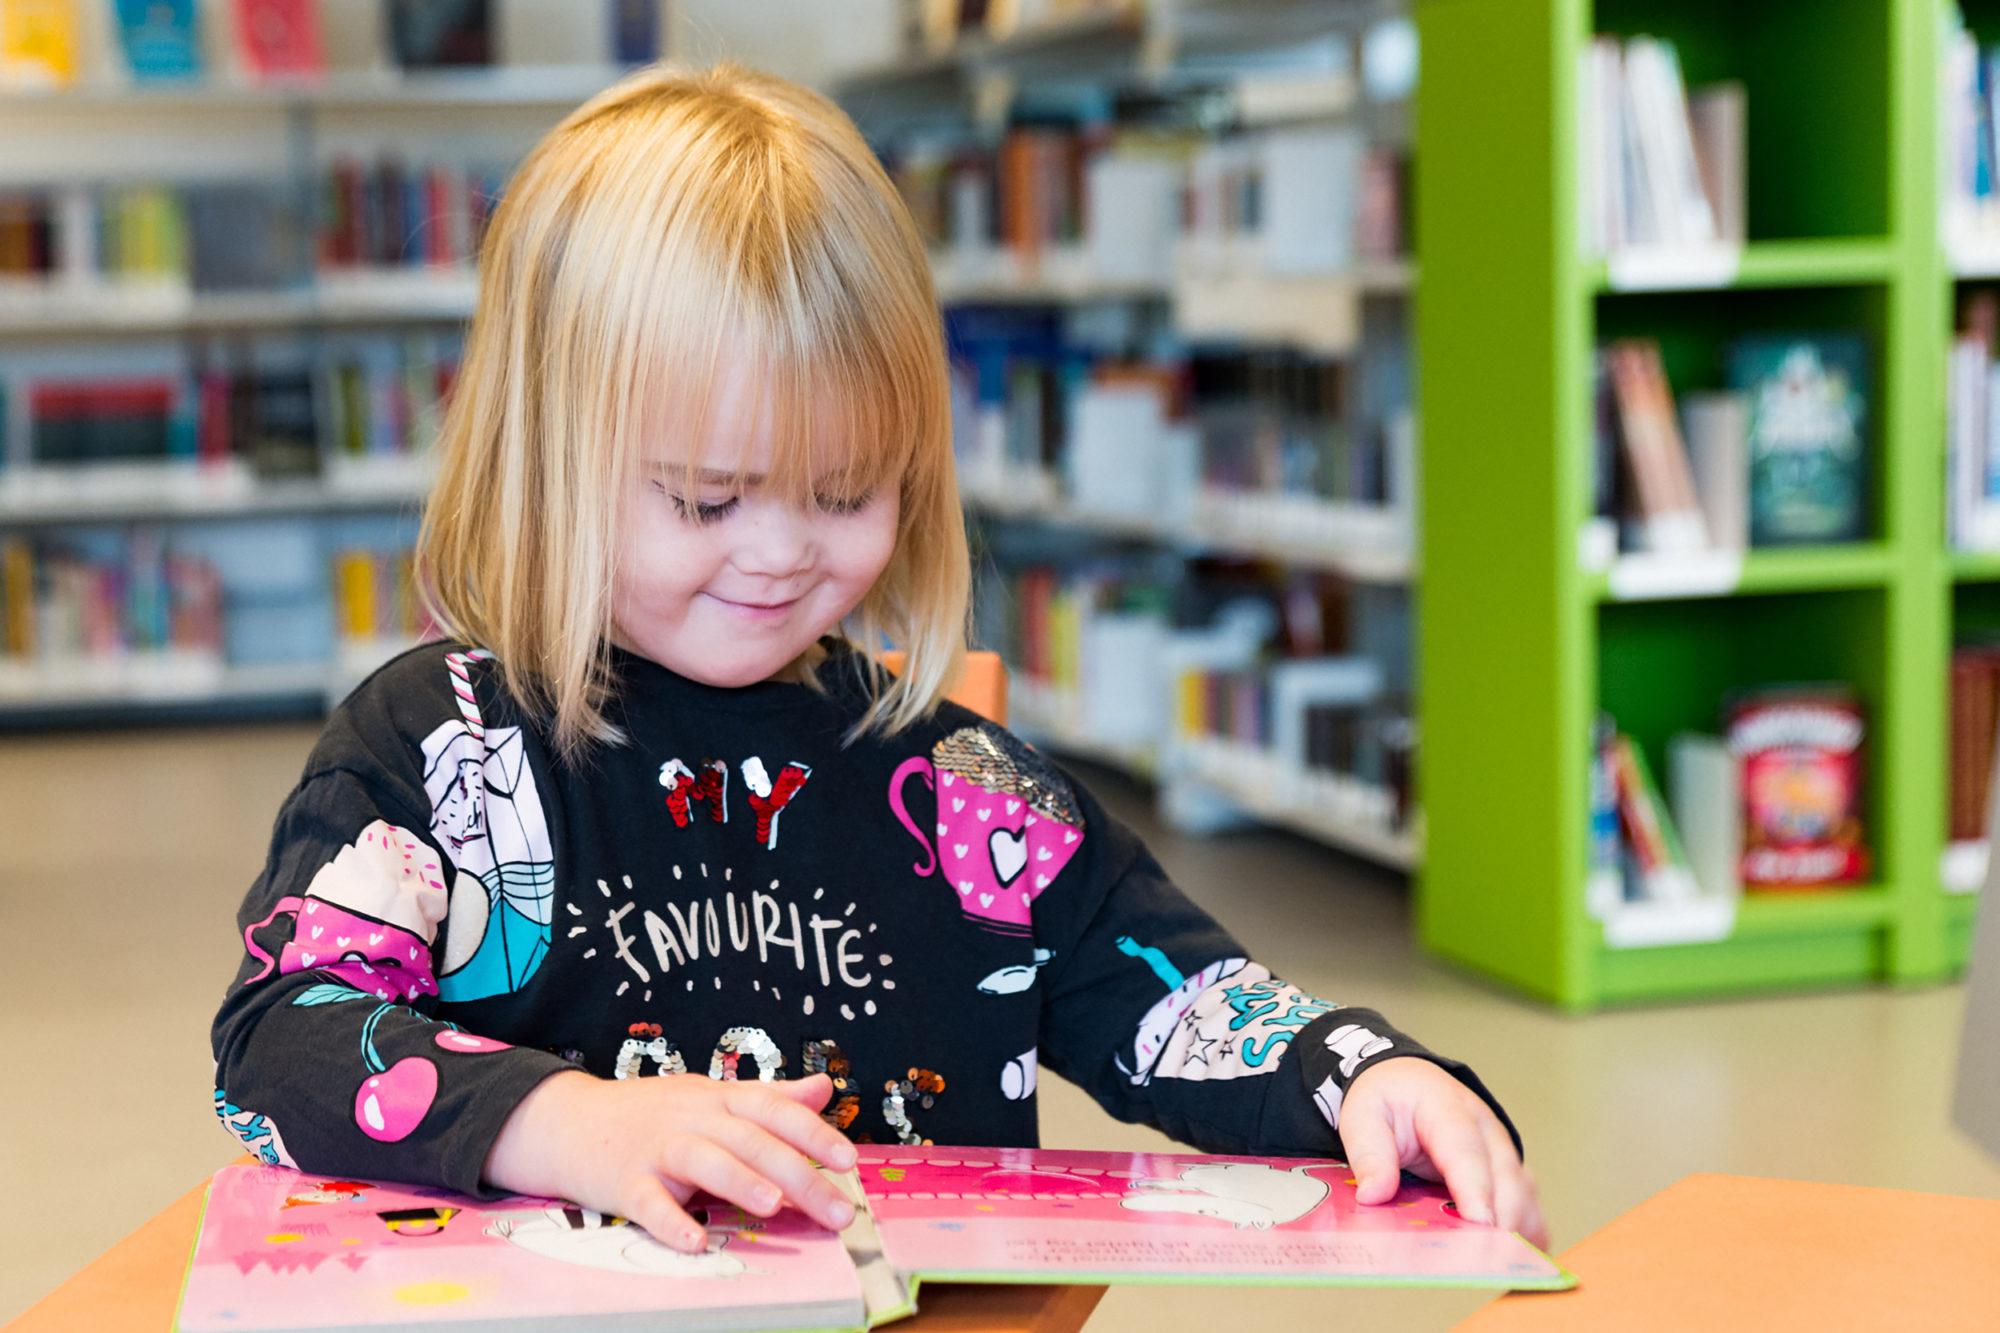 Barnehagebarn på biblioteket